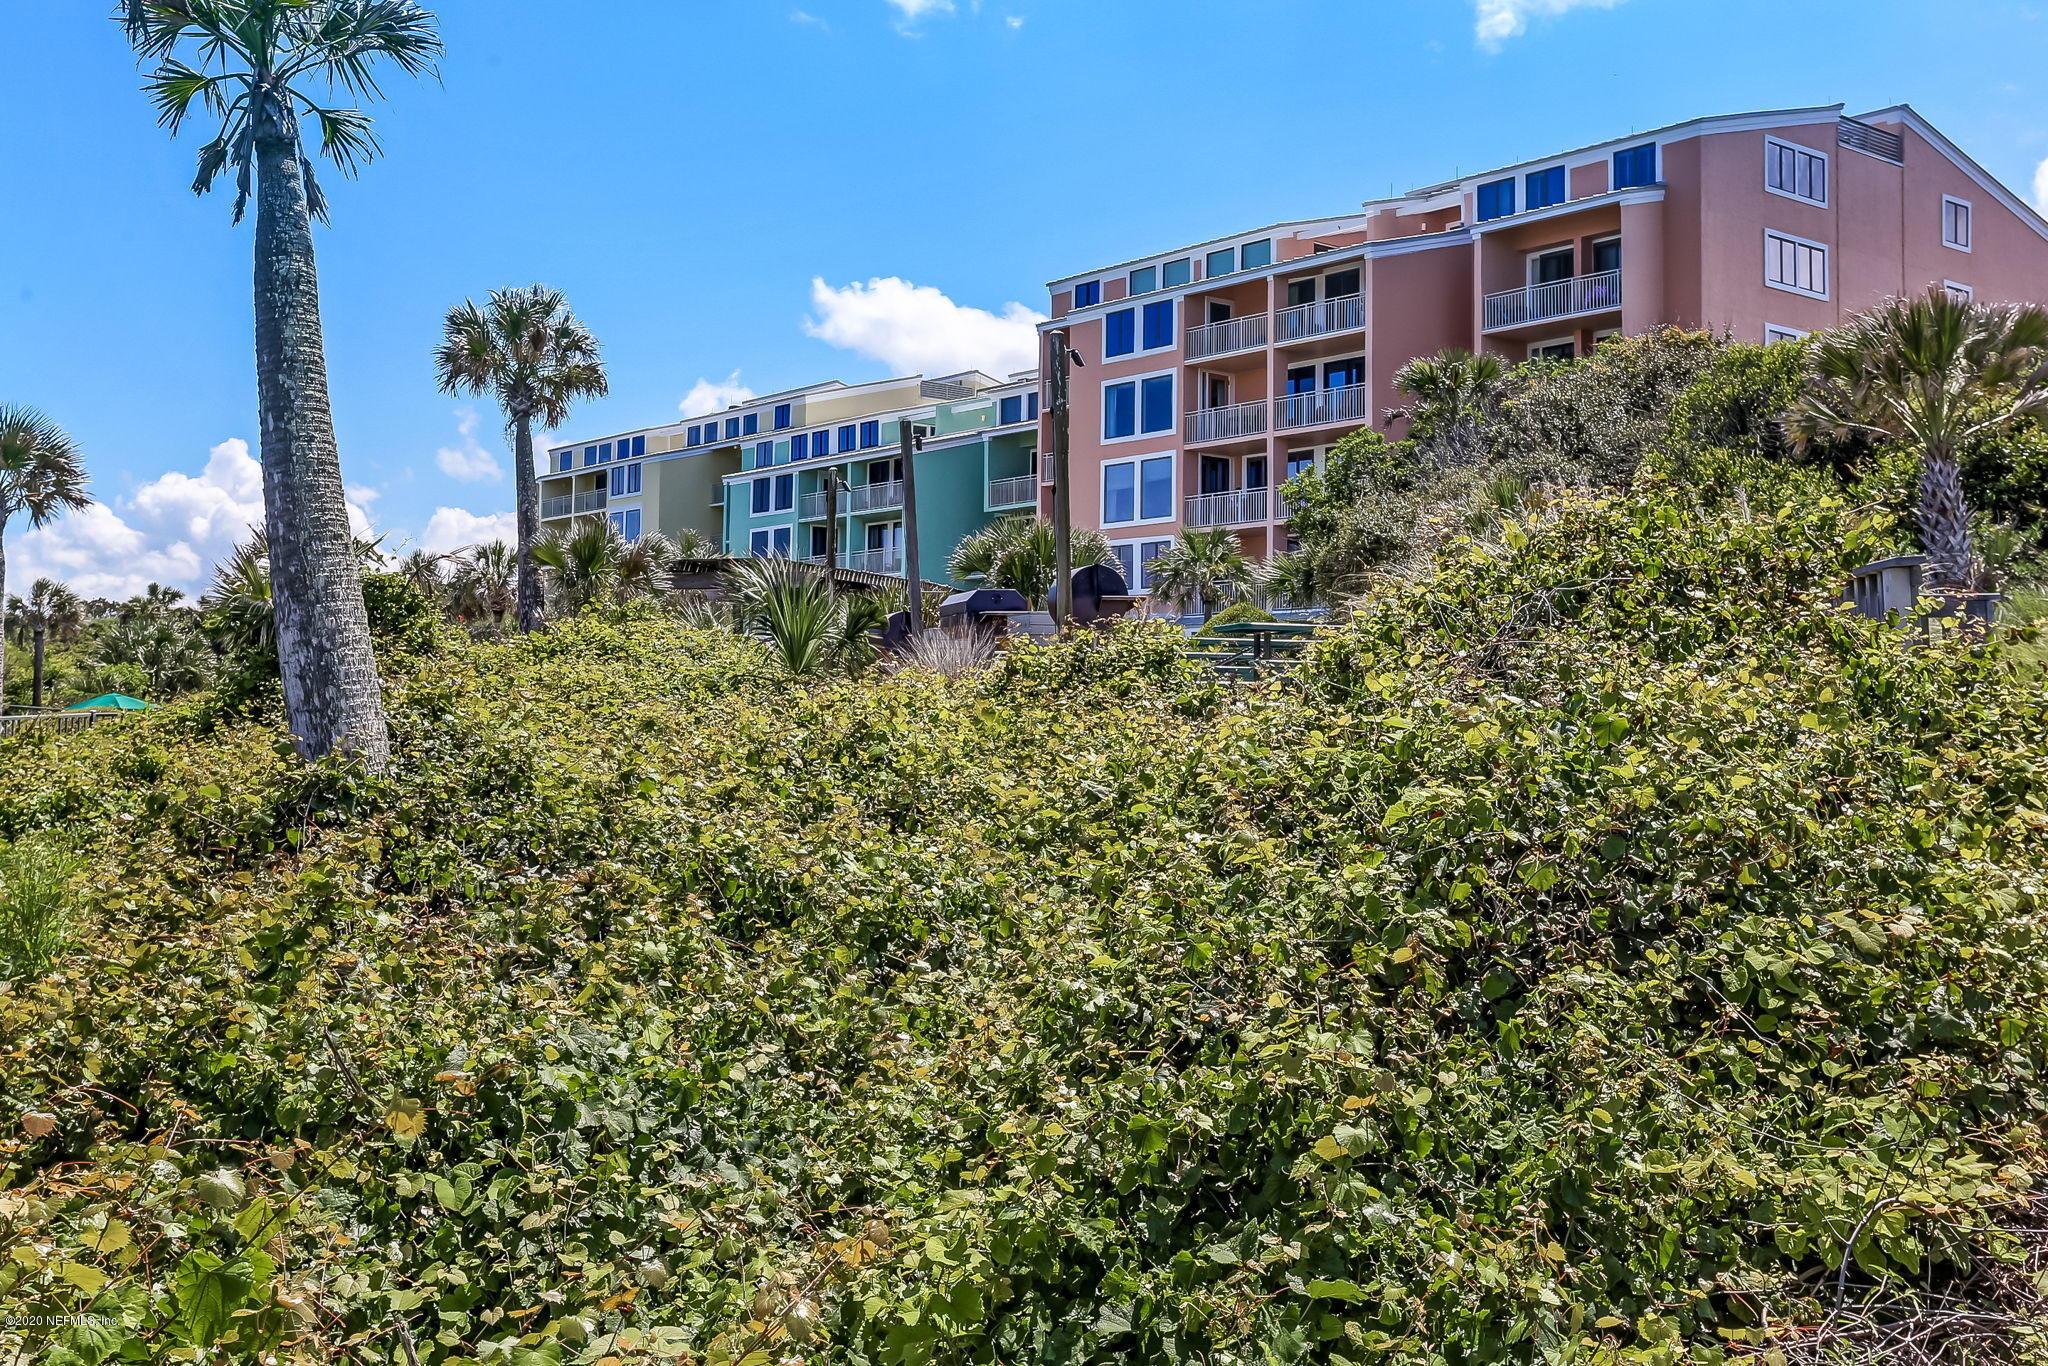 1319 SHIPWATCH, FERNANDINA BEACH, FLORIDA 32034, 3 Bedrooms Bedrooms, ,3 BathroomsBathrooms,Residential,For sale,SHIPWATCH,1065906